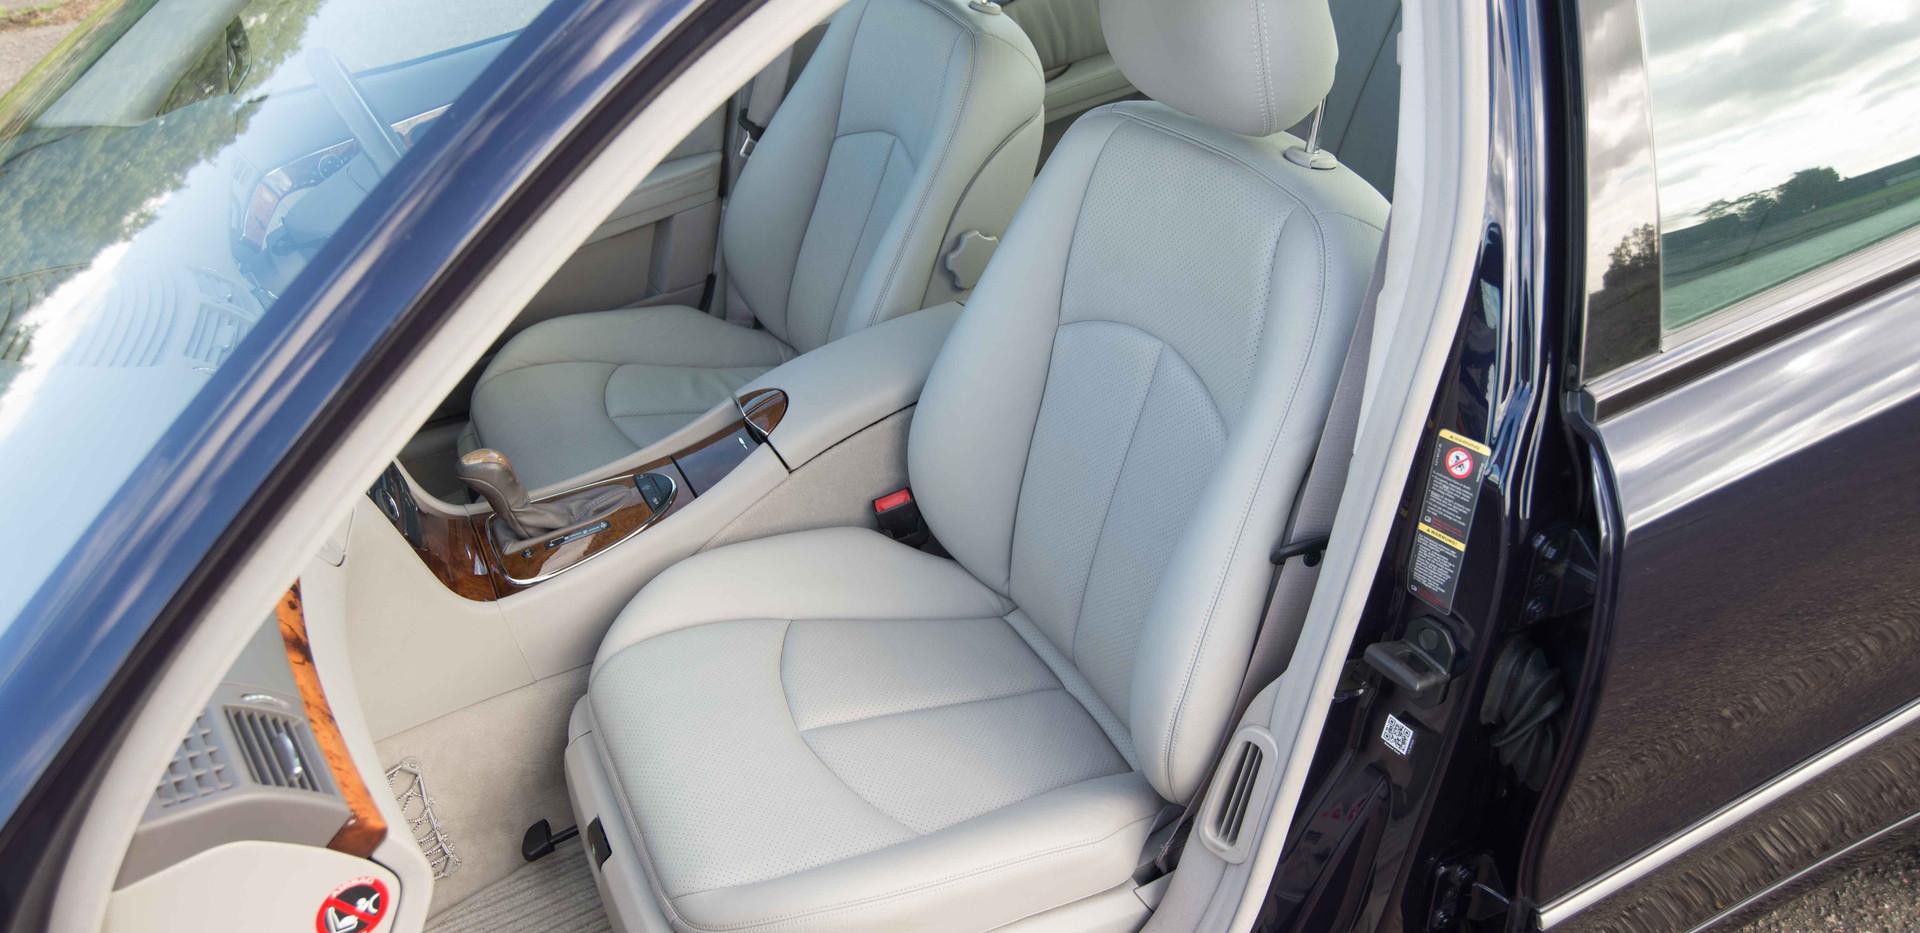 Mercedes E500 For Sale UK London  (43 of